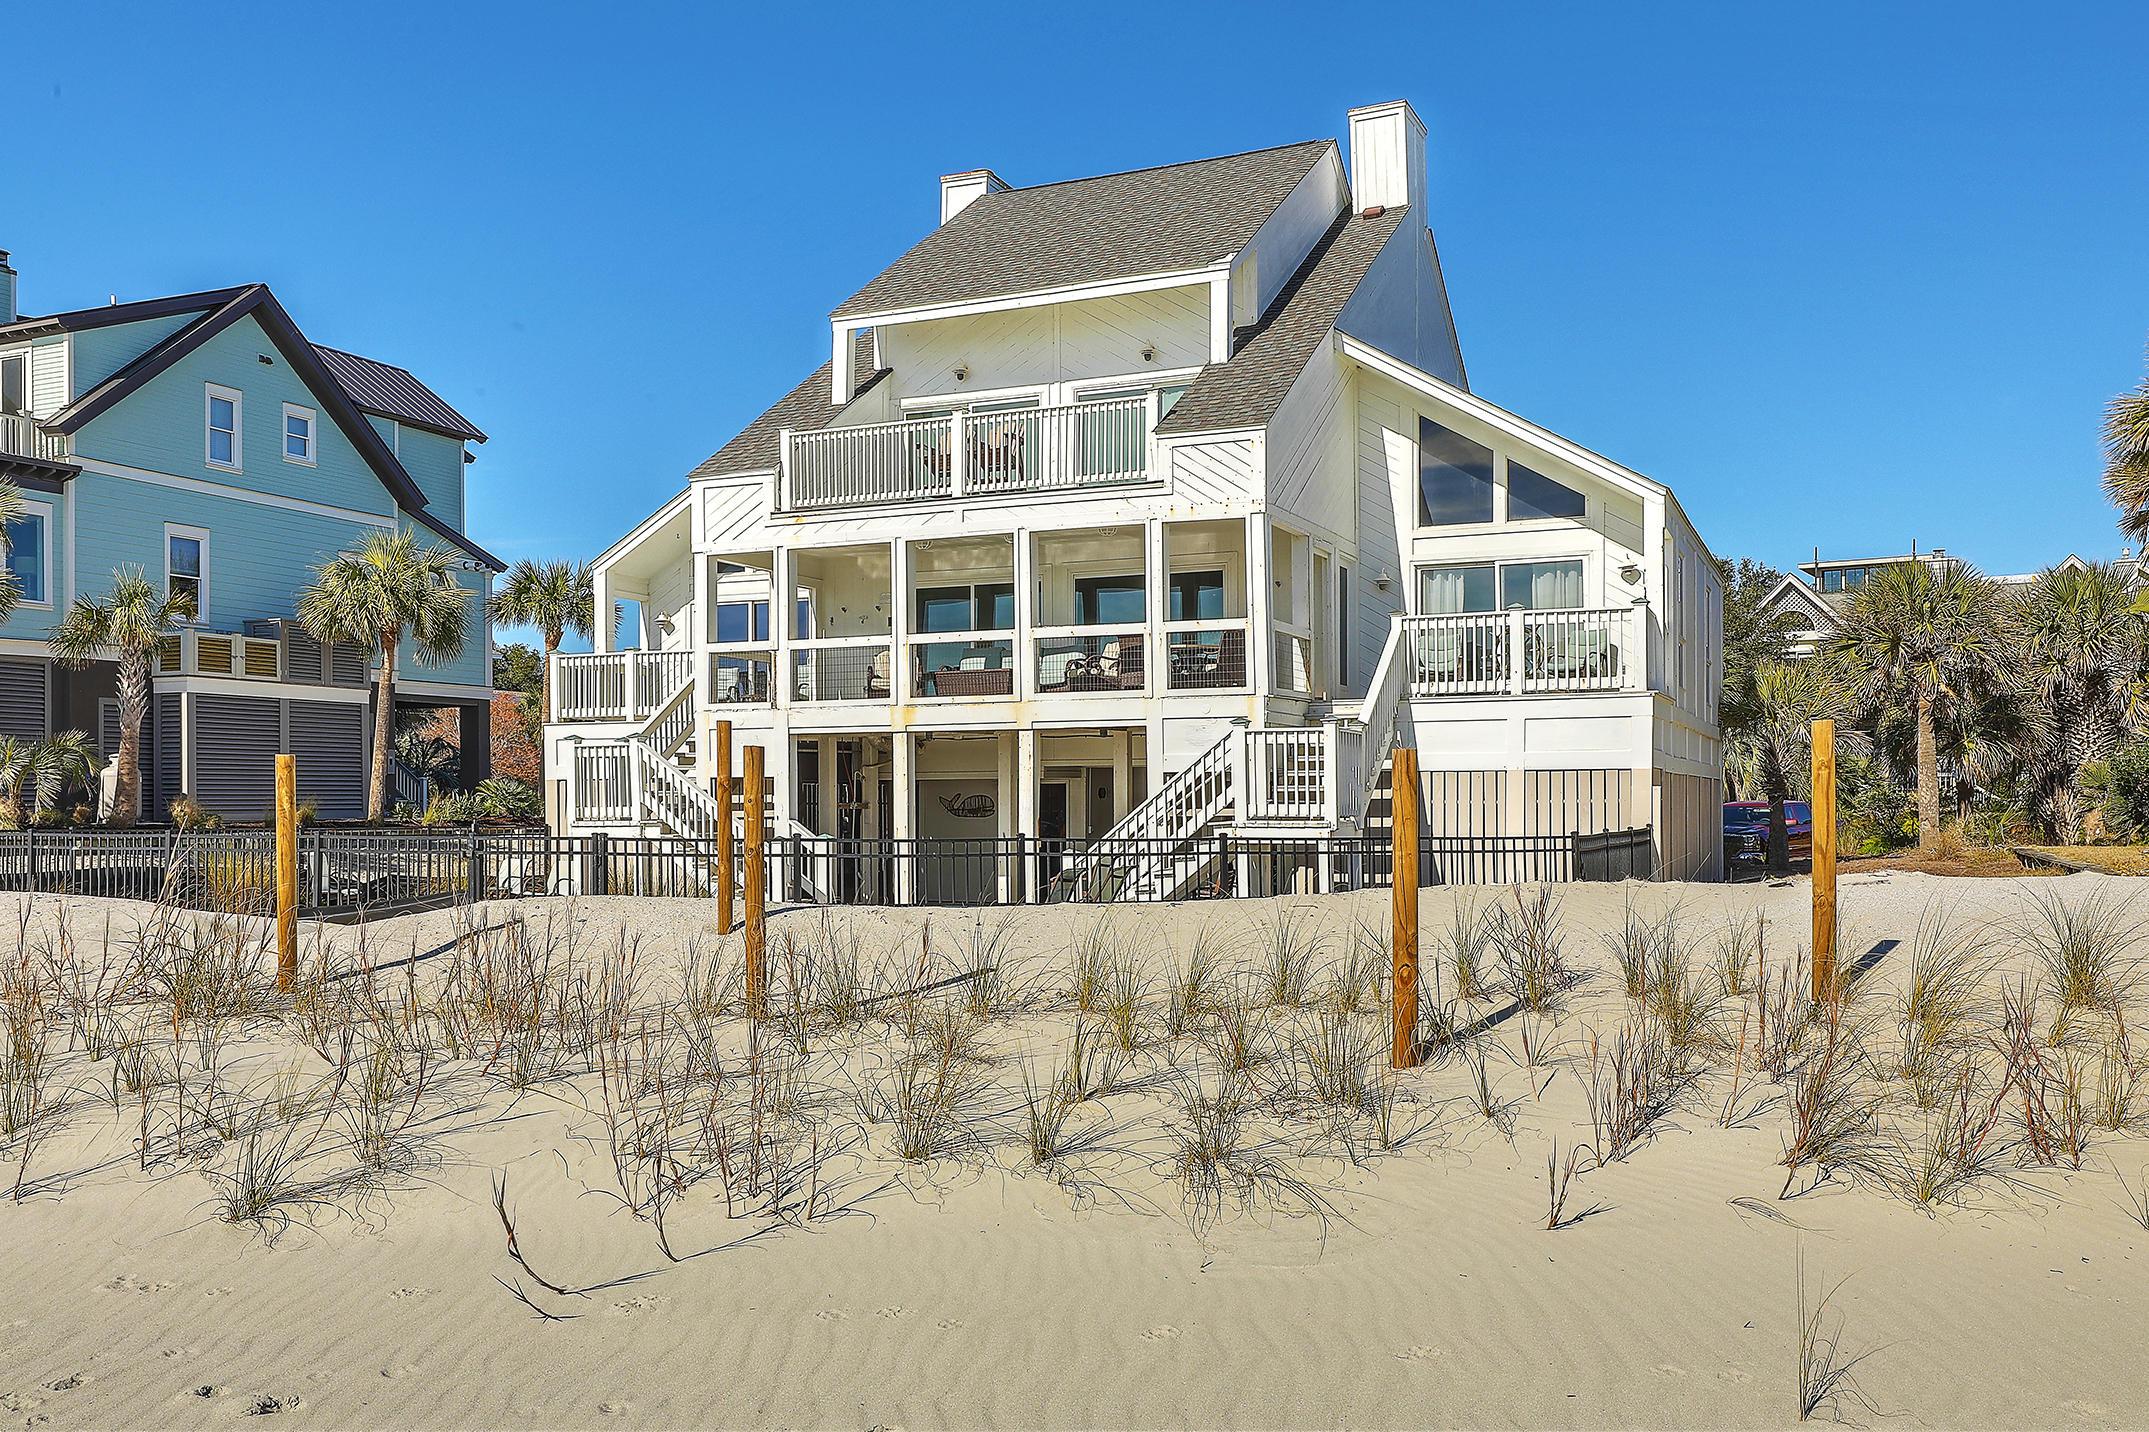 Wild Dunes Homes For Sale - 14 Beachwood East, Isle of Palms, SC - 41